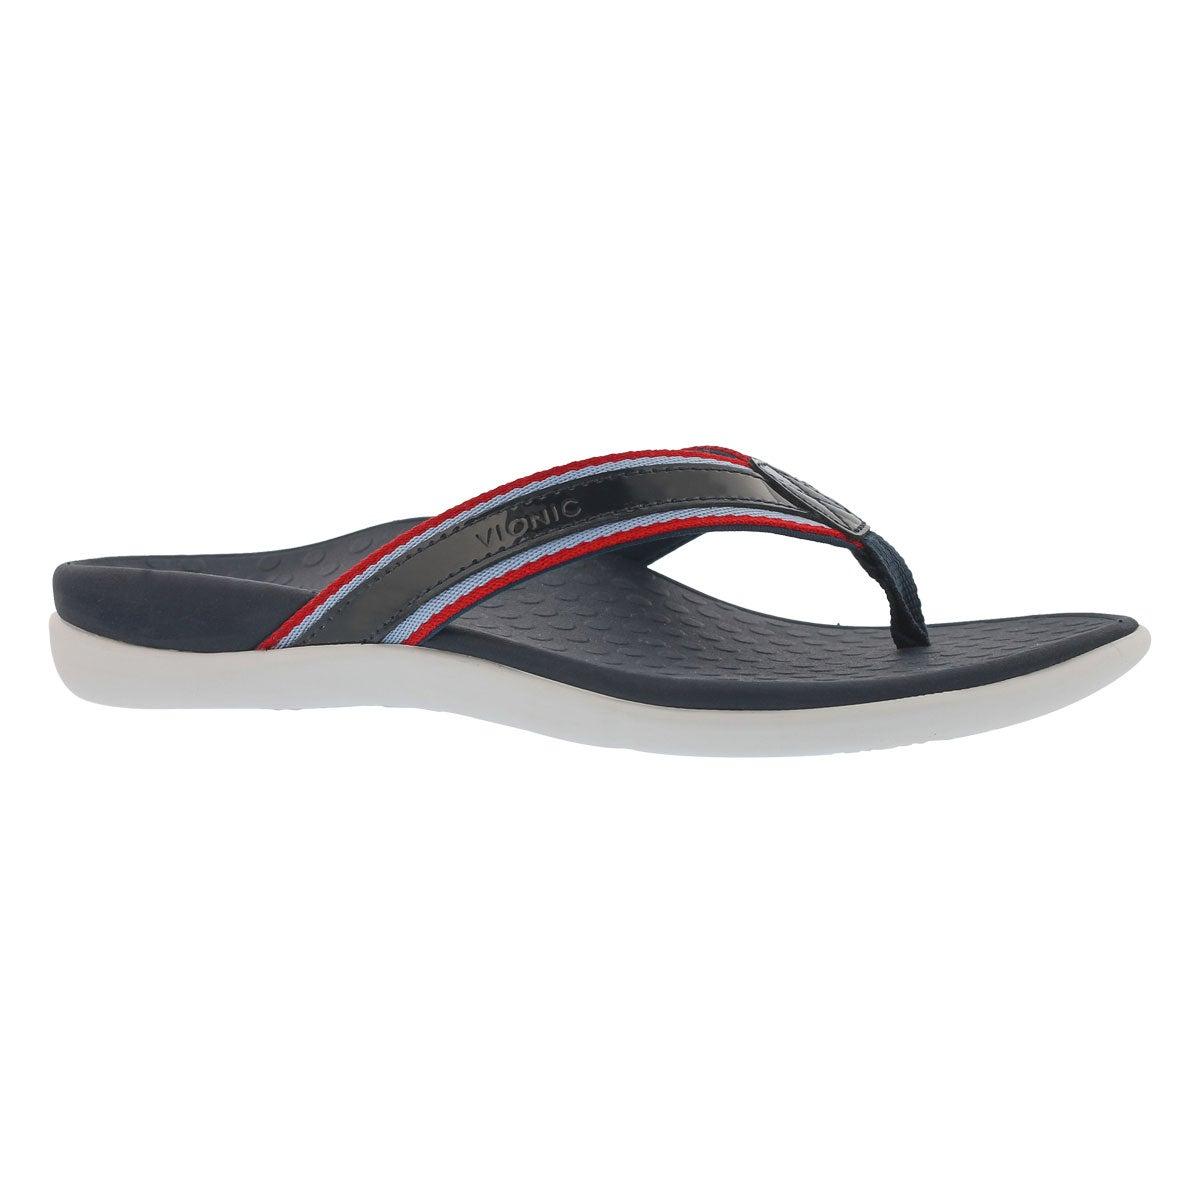 613f4817a2c25 Vionic Women s TIDE SPORTnavy arch support thong sandals Women s Sandals  Blue. Online Only. Lds TideSport nvy arch support thng sndl